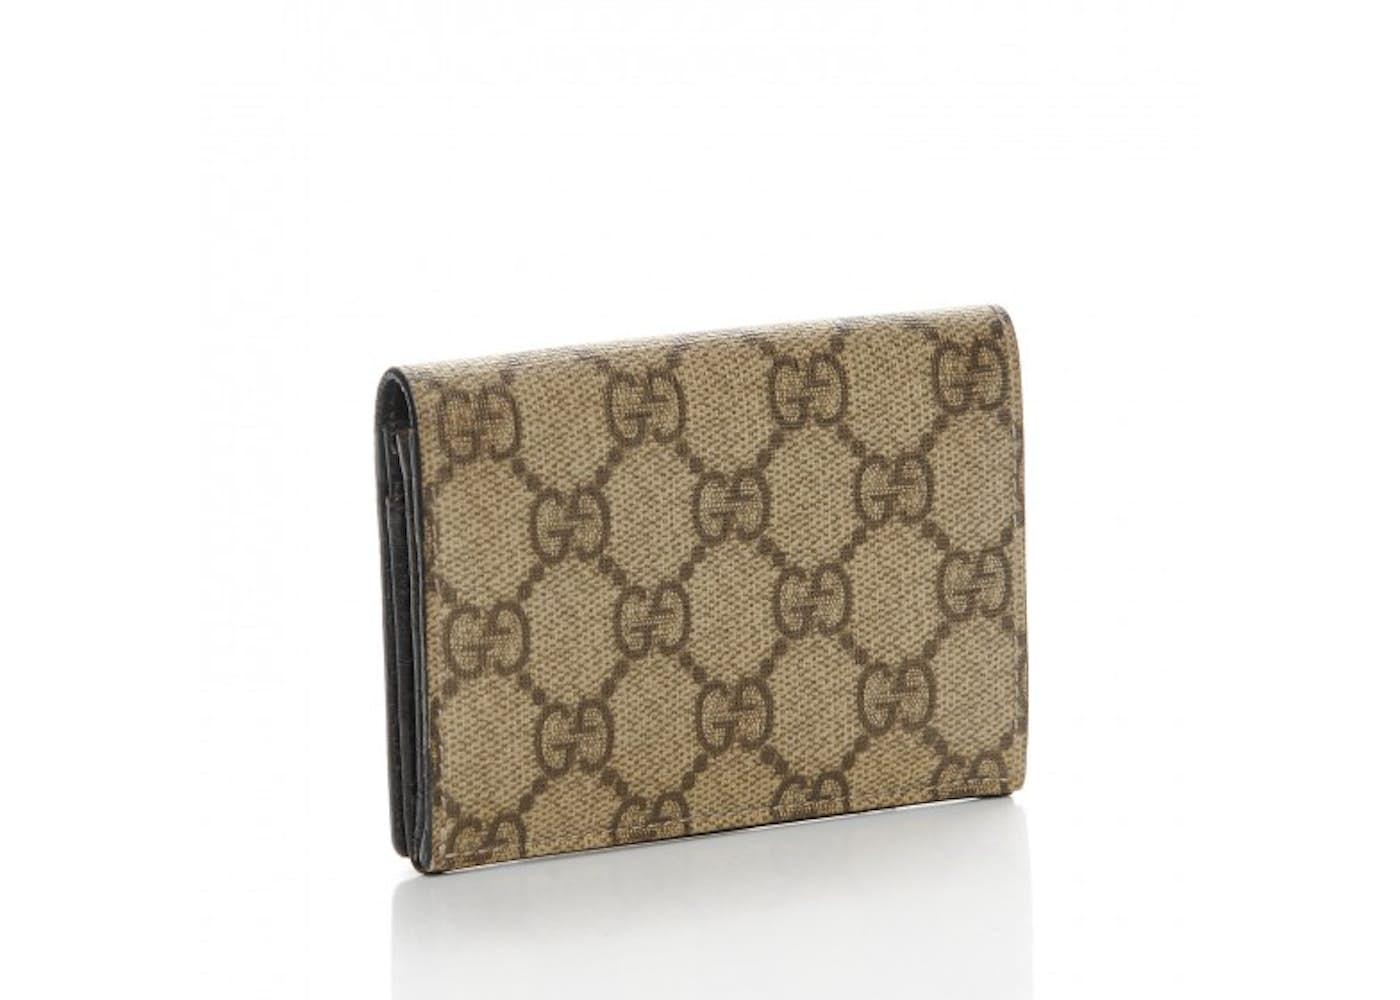 Leather business card holder monogram arts arts gucci business card holder wallet monogram gg plus brown beige colourmoves